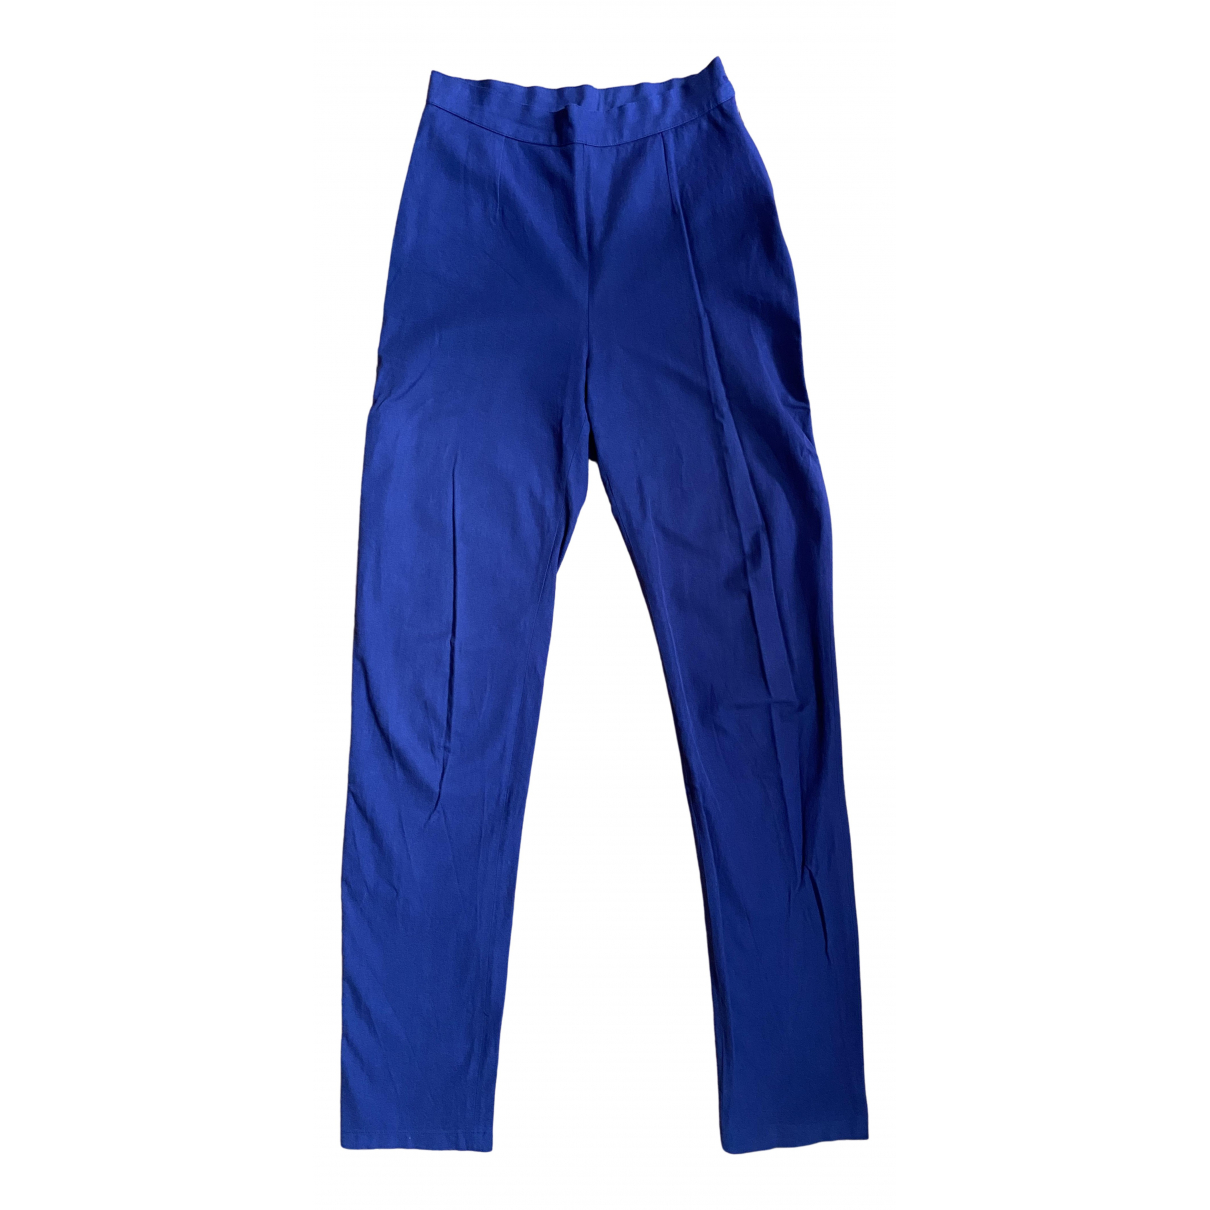 Isabel Marant N Purple Cotton Trousers for Women 1 0-5